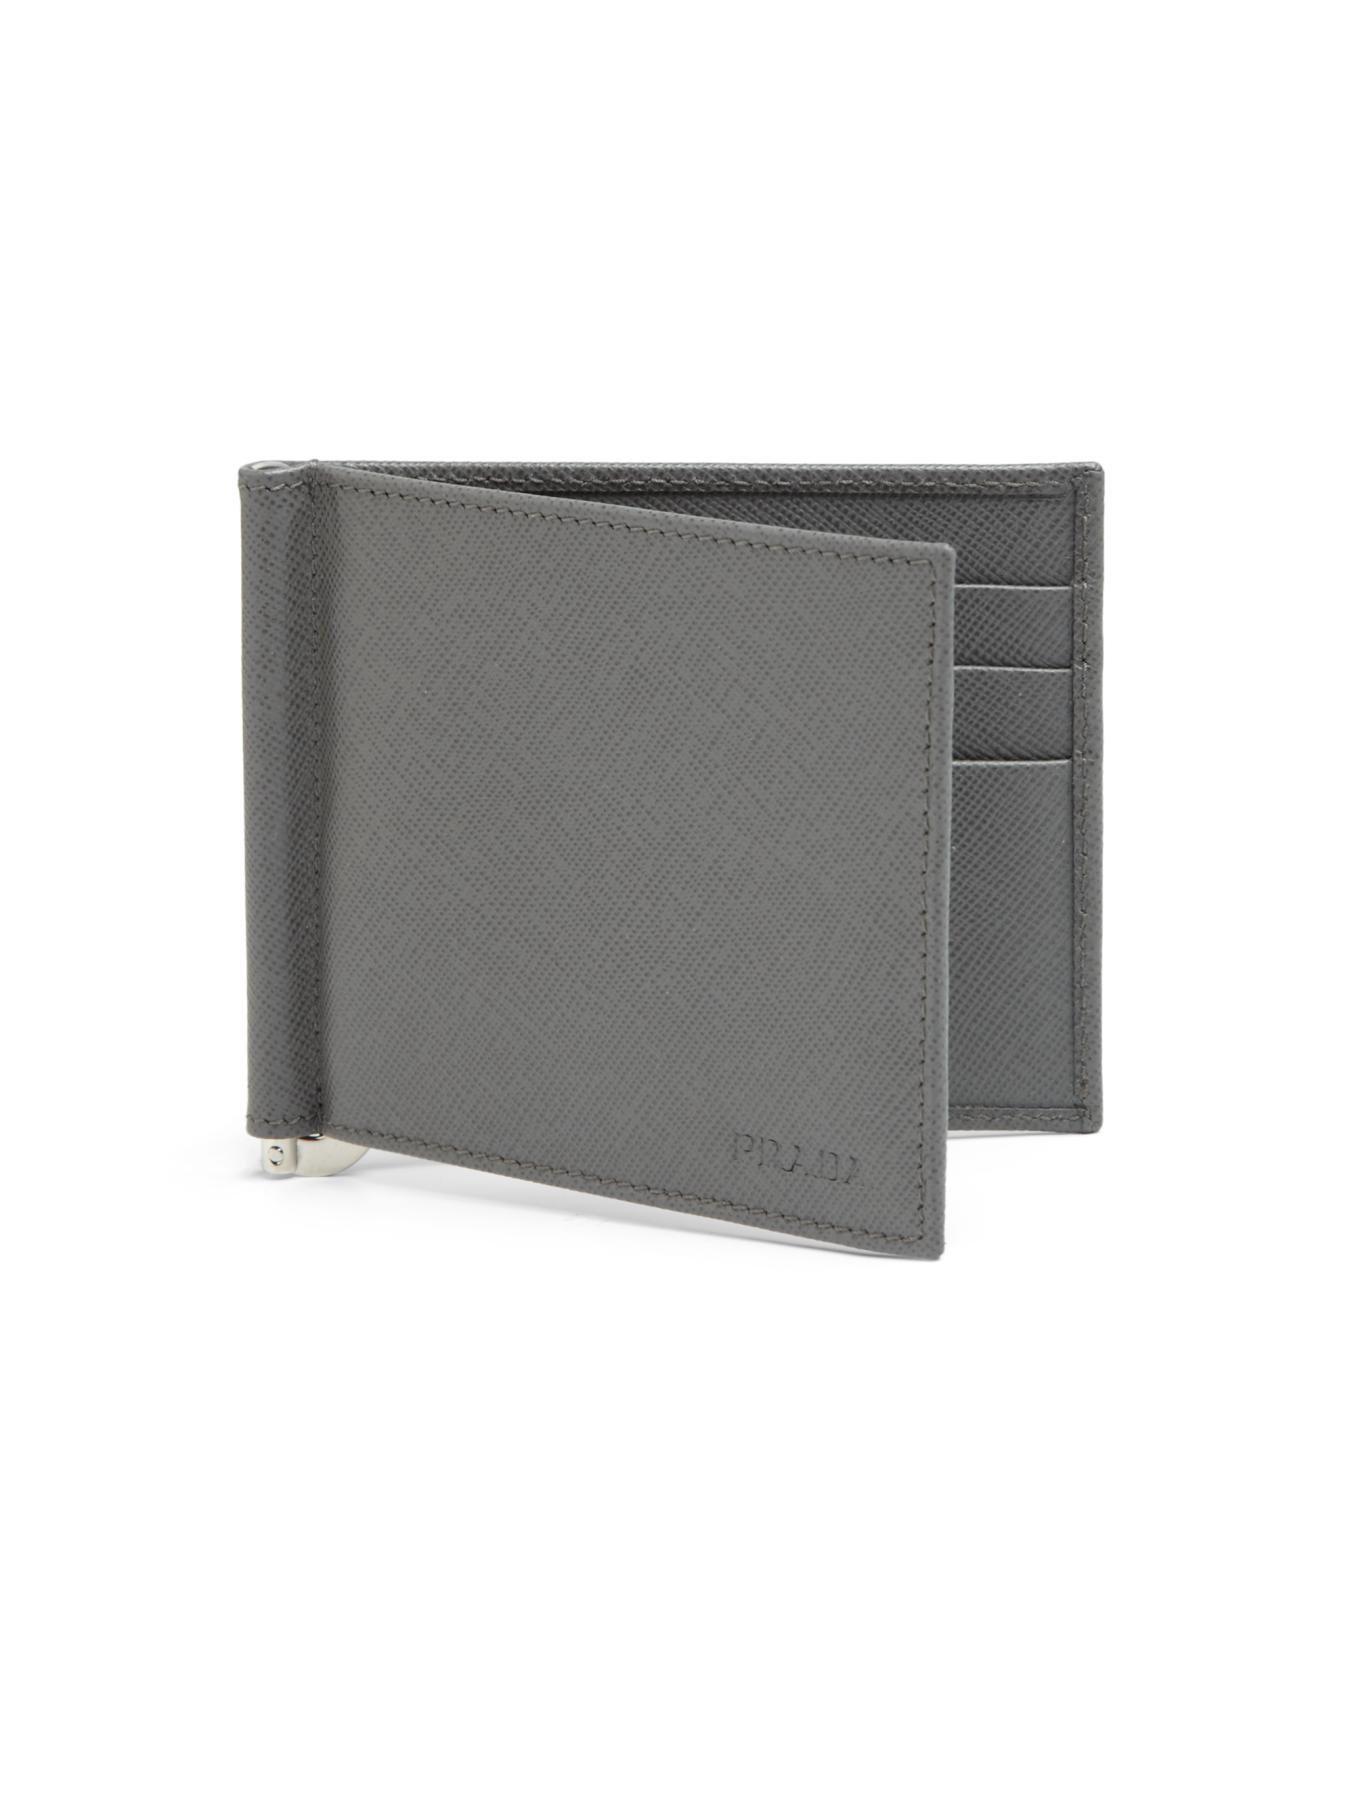 cd46cd10ff65 Prada Leather Money Clip Wallet in Gray for Men - Lyst